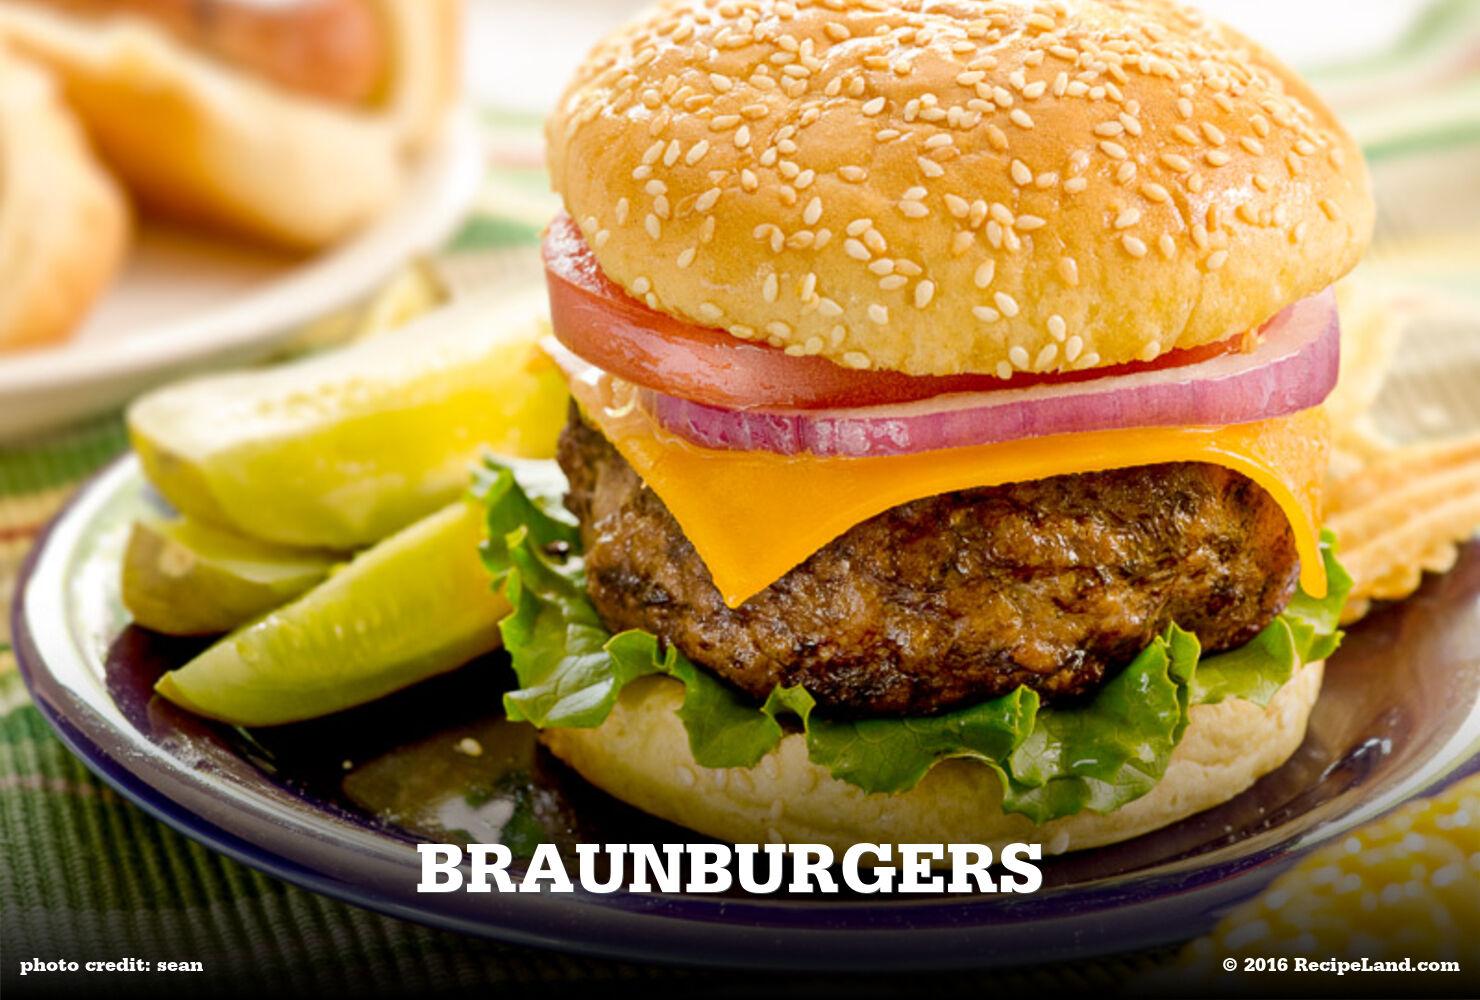 Braunburgers